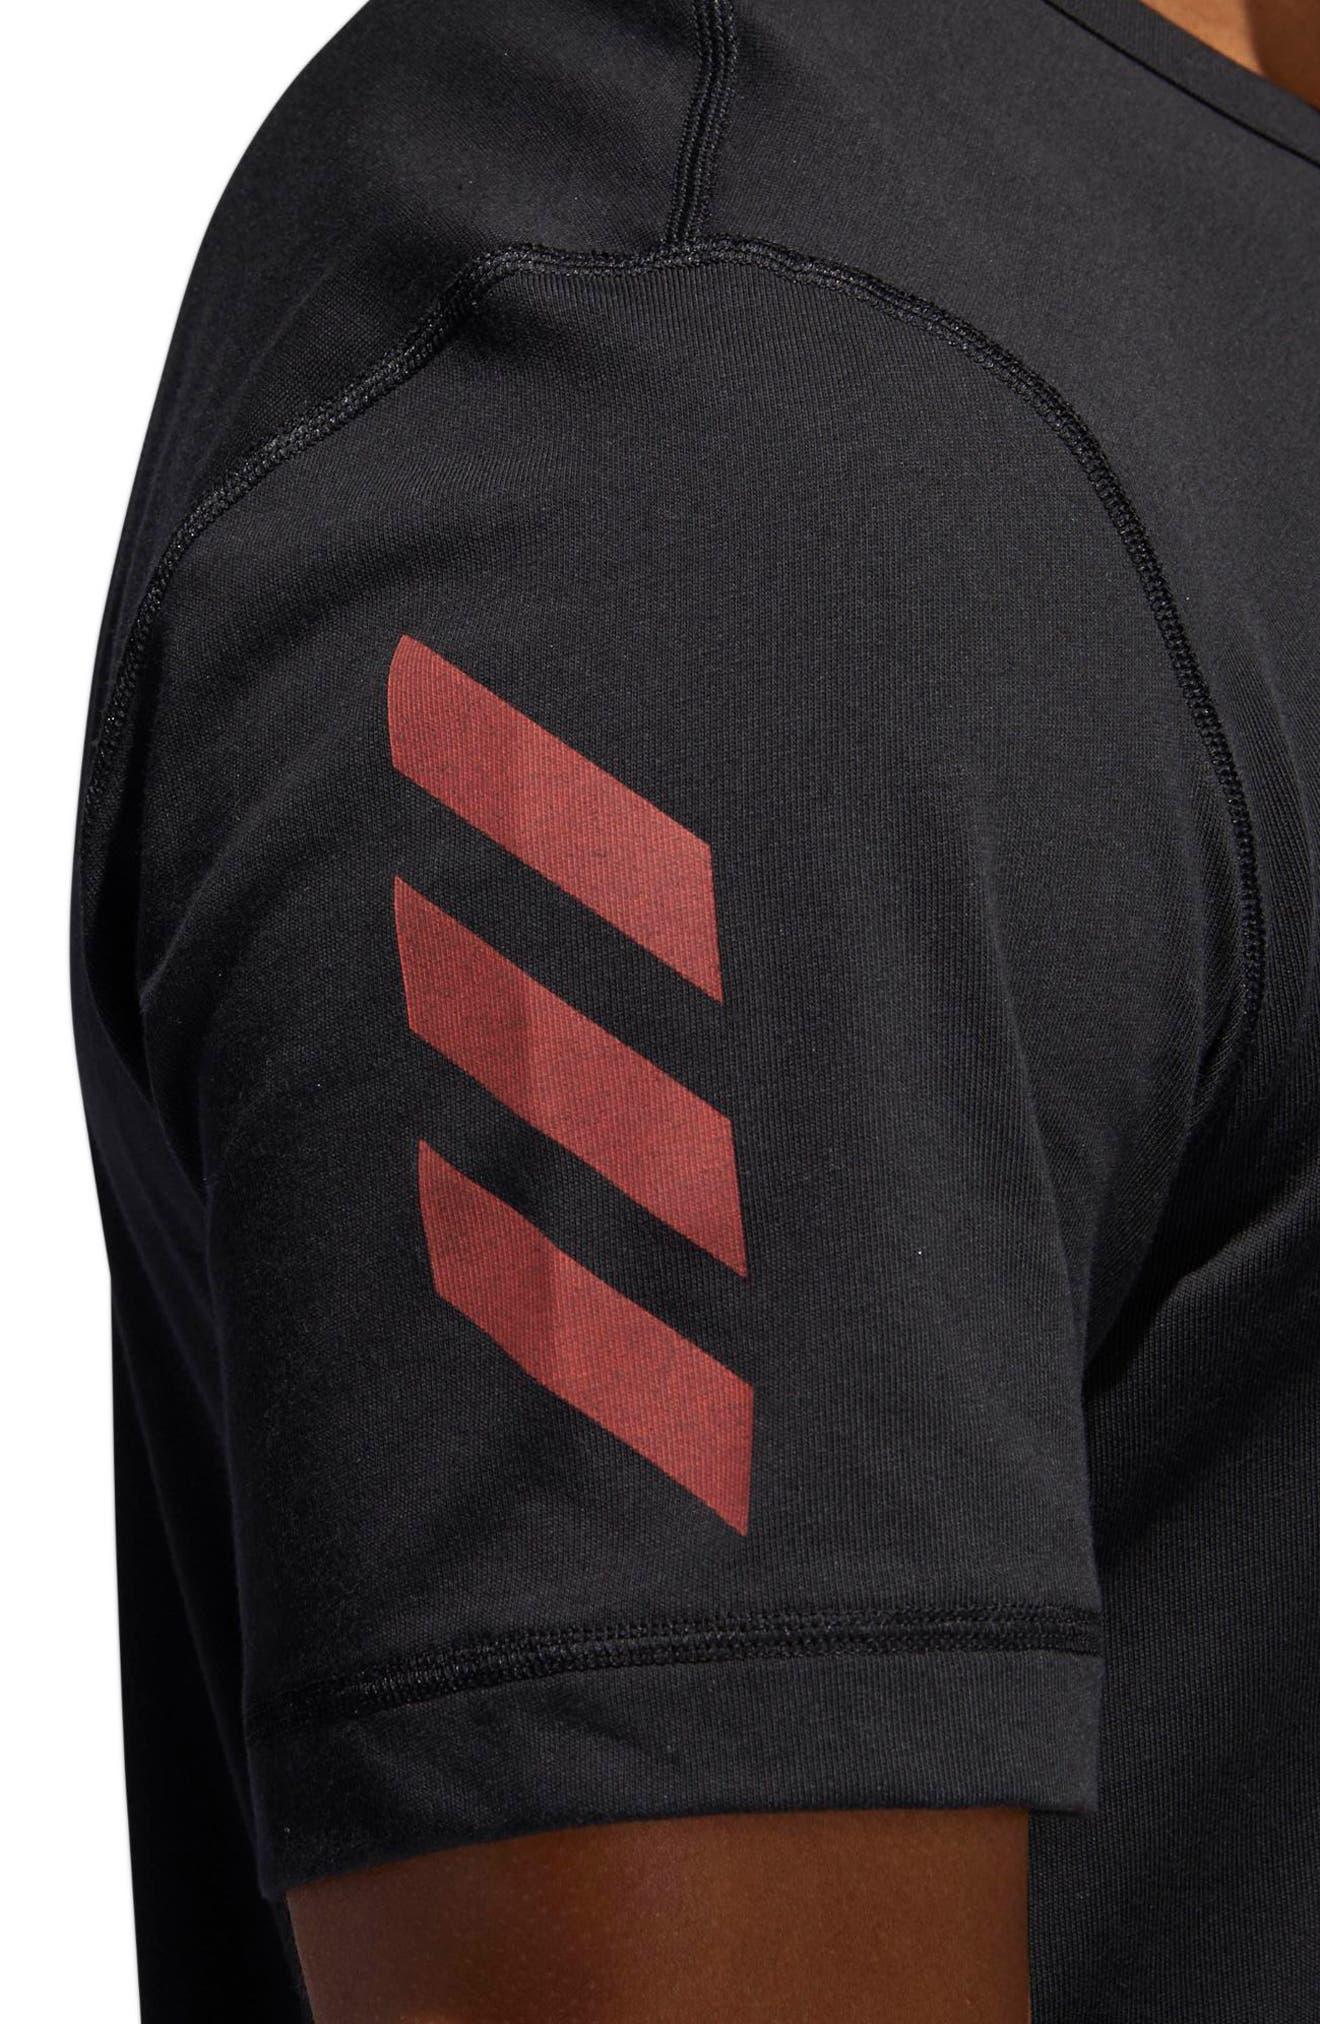 Harden Brand Slogan T-Shirt,                             Alternate thumbnail 6, color,                             Black